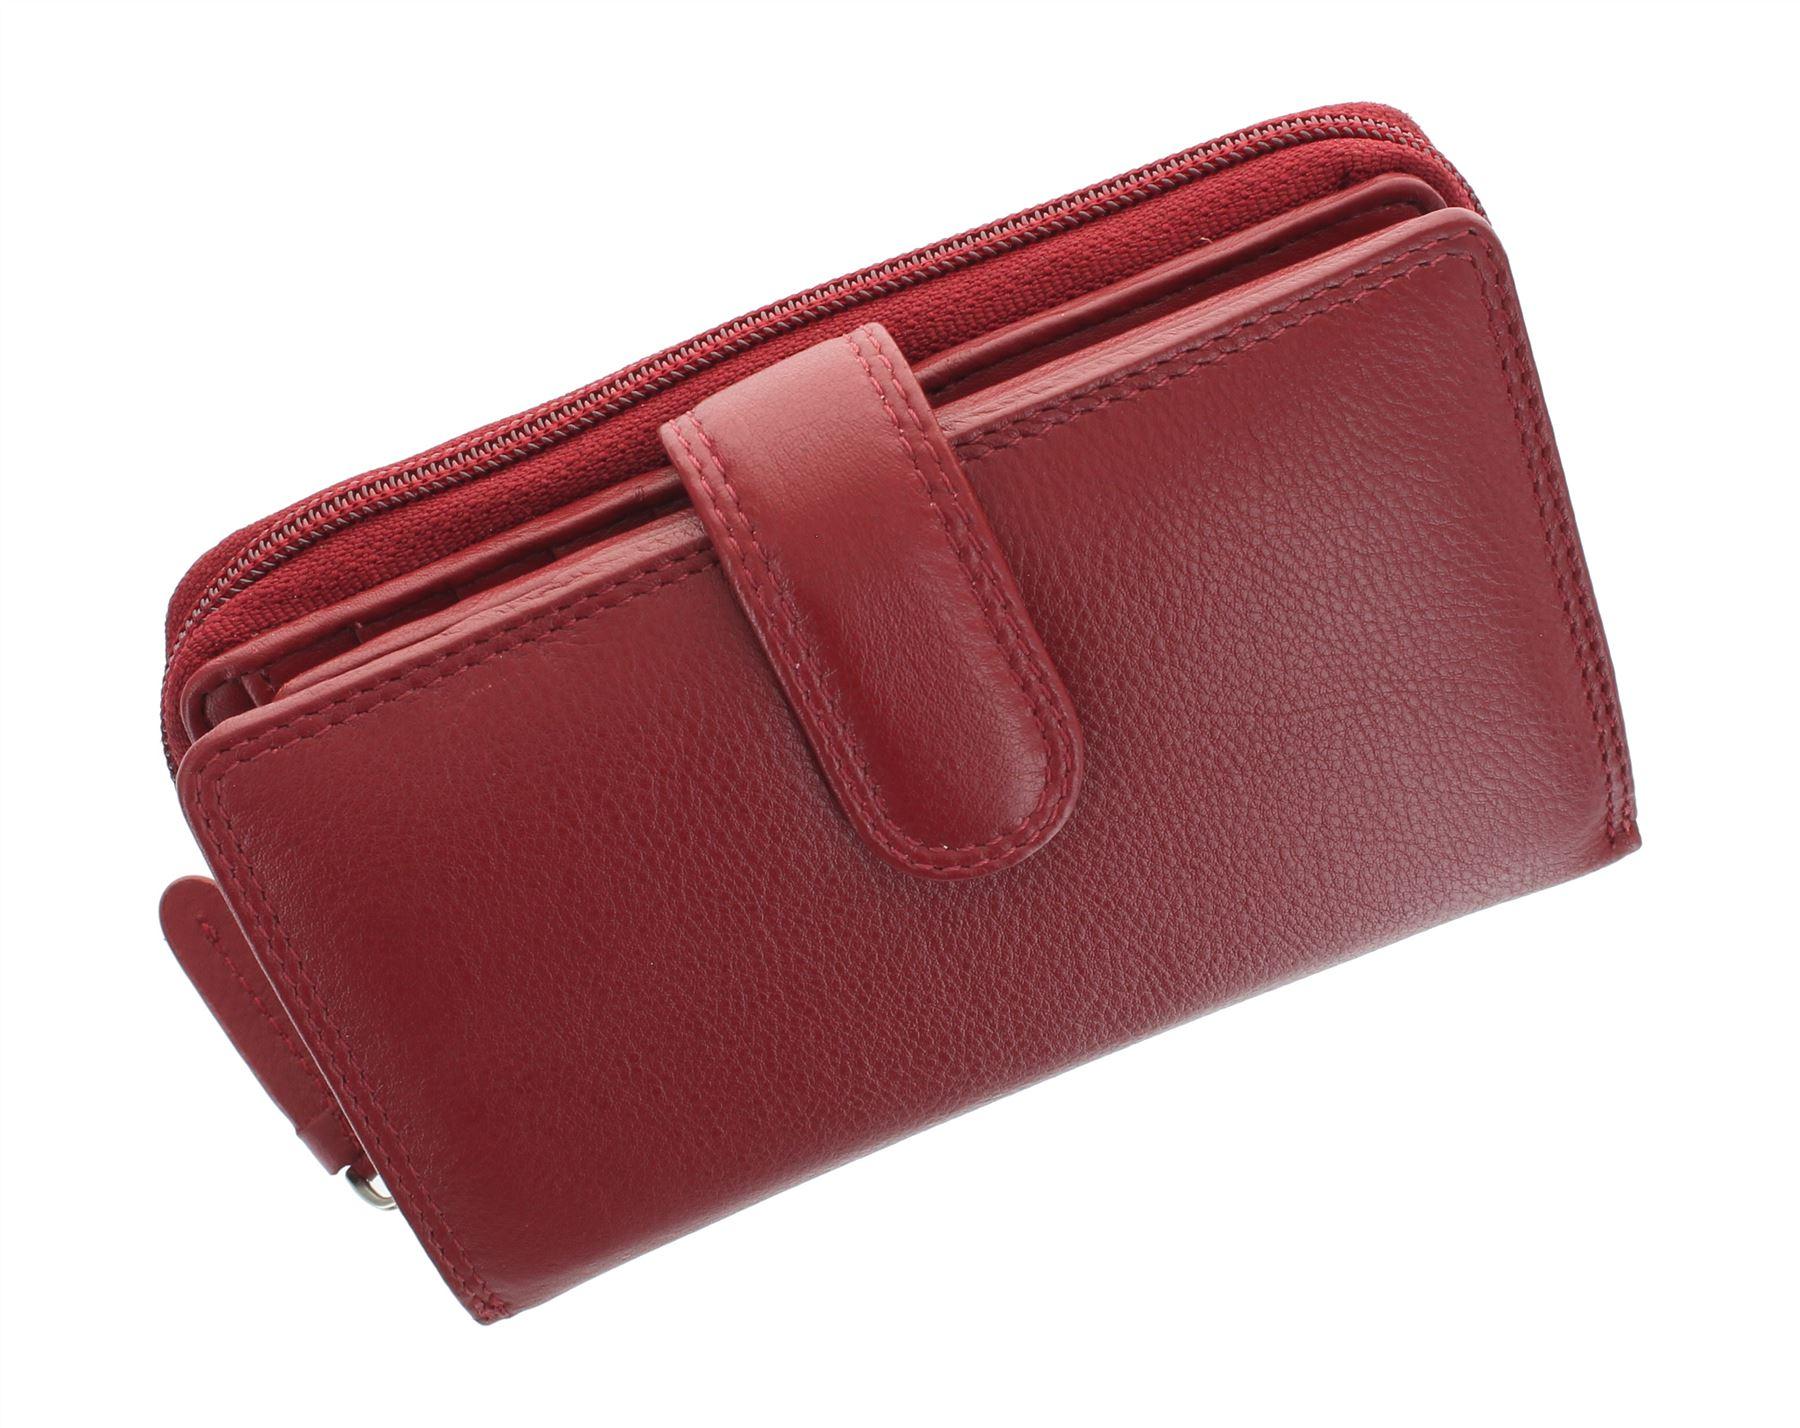 Visconti-Heritage-Collection-MADAME-Leather-Purse-Tab-Closure-RFID-blocking-HT33 miniatura 22